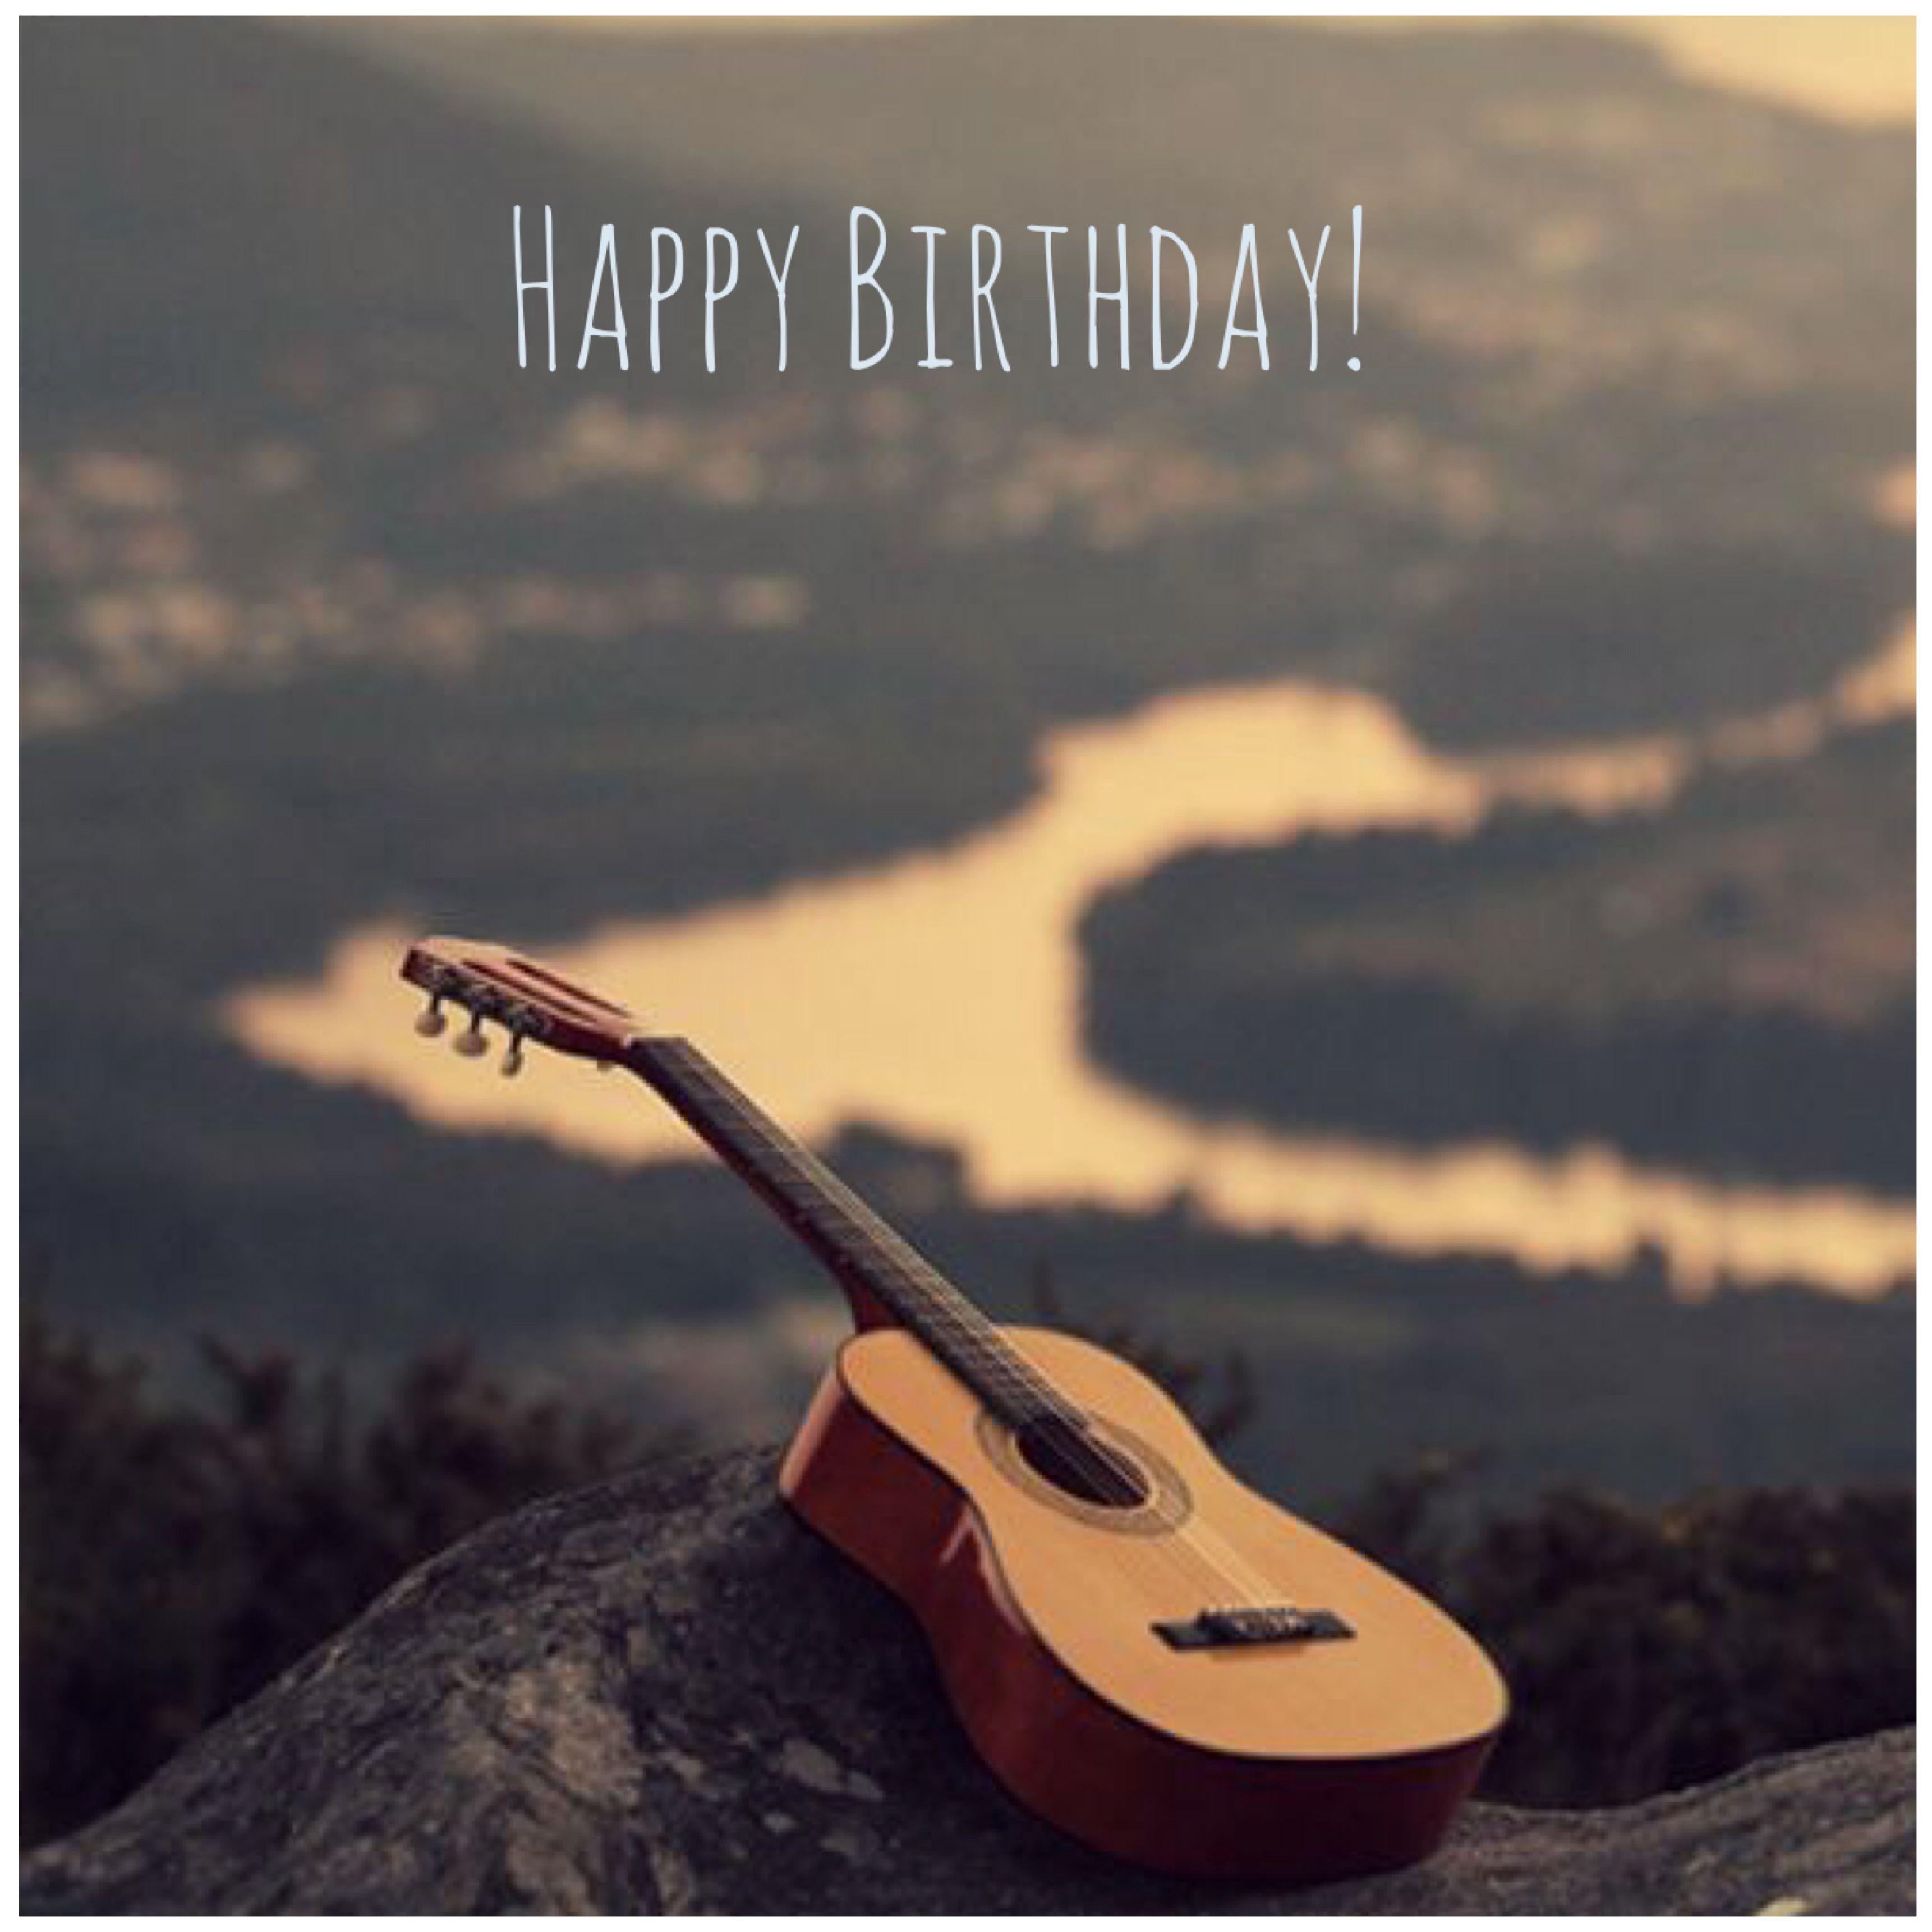 Happy Birthday Guitar Greetings And Salutations Happy Birthday